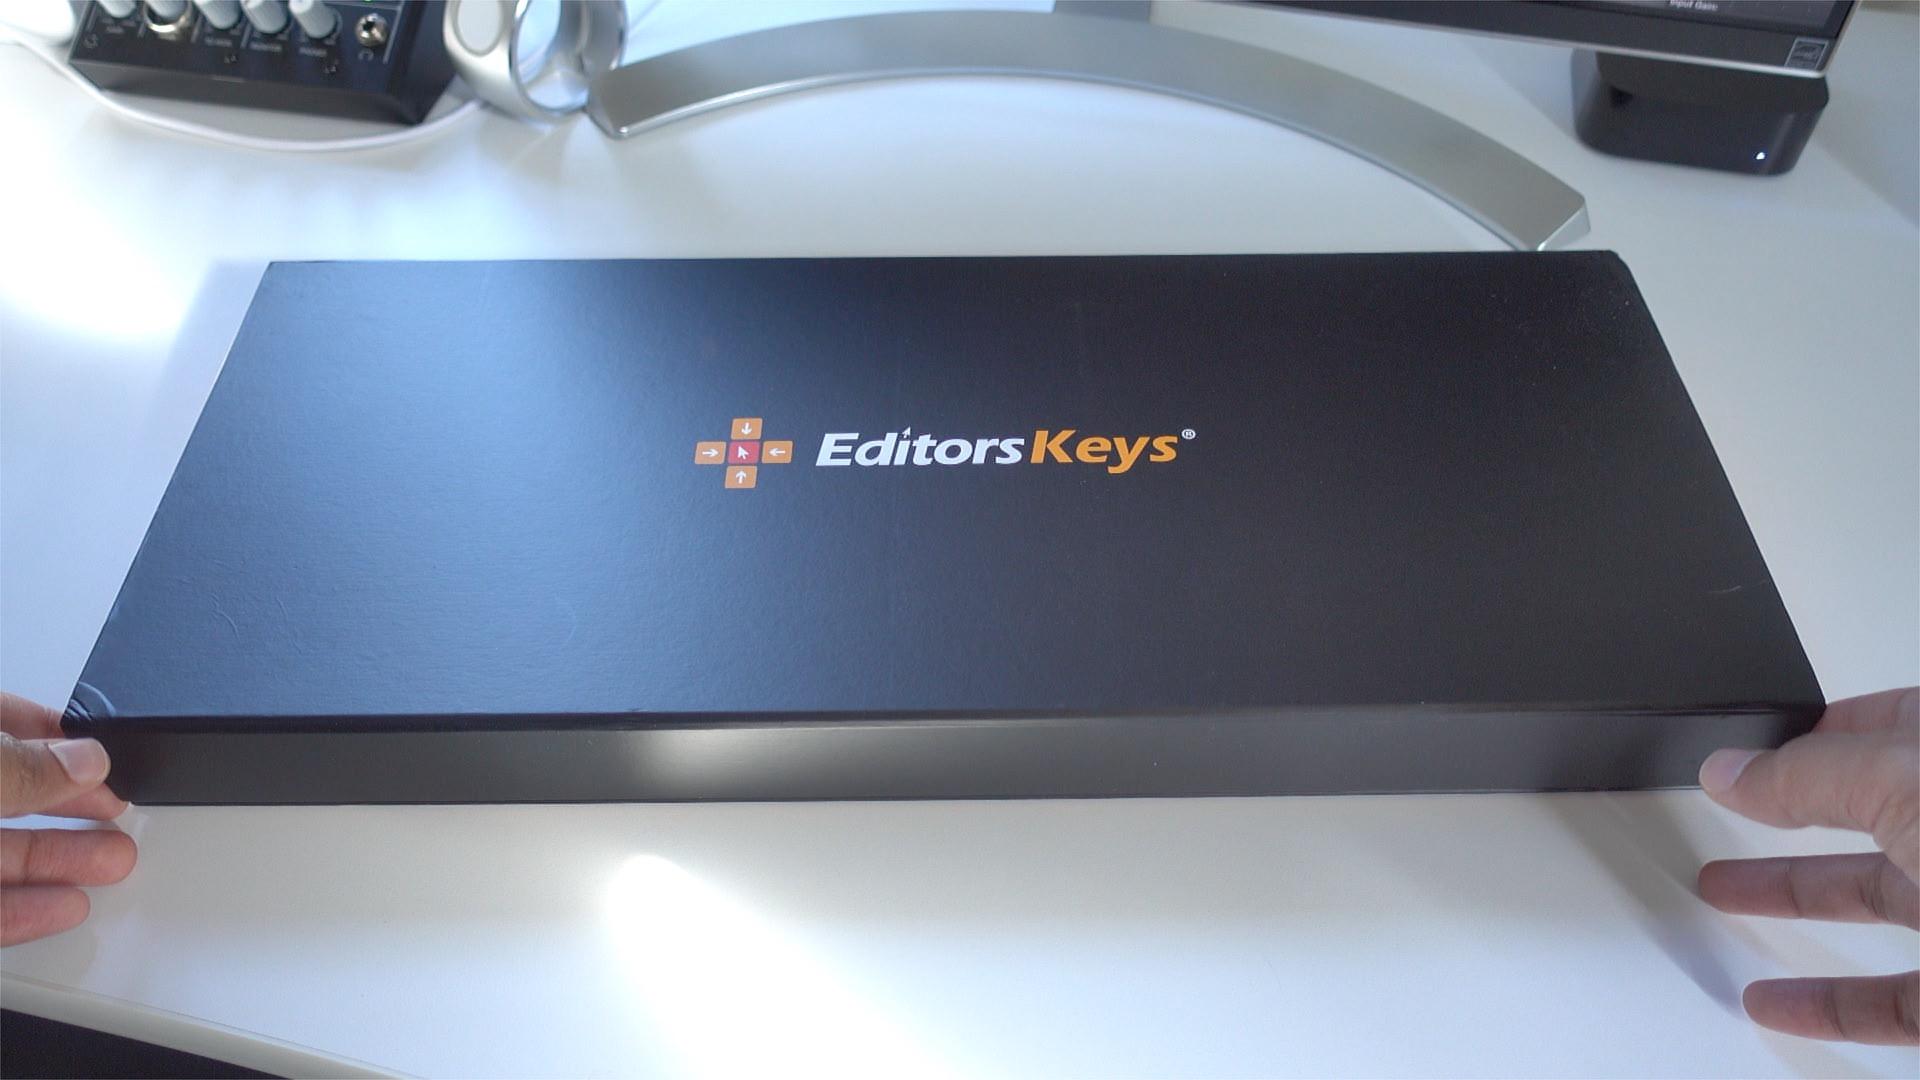 EditorsKeys Box